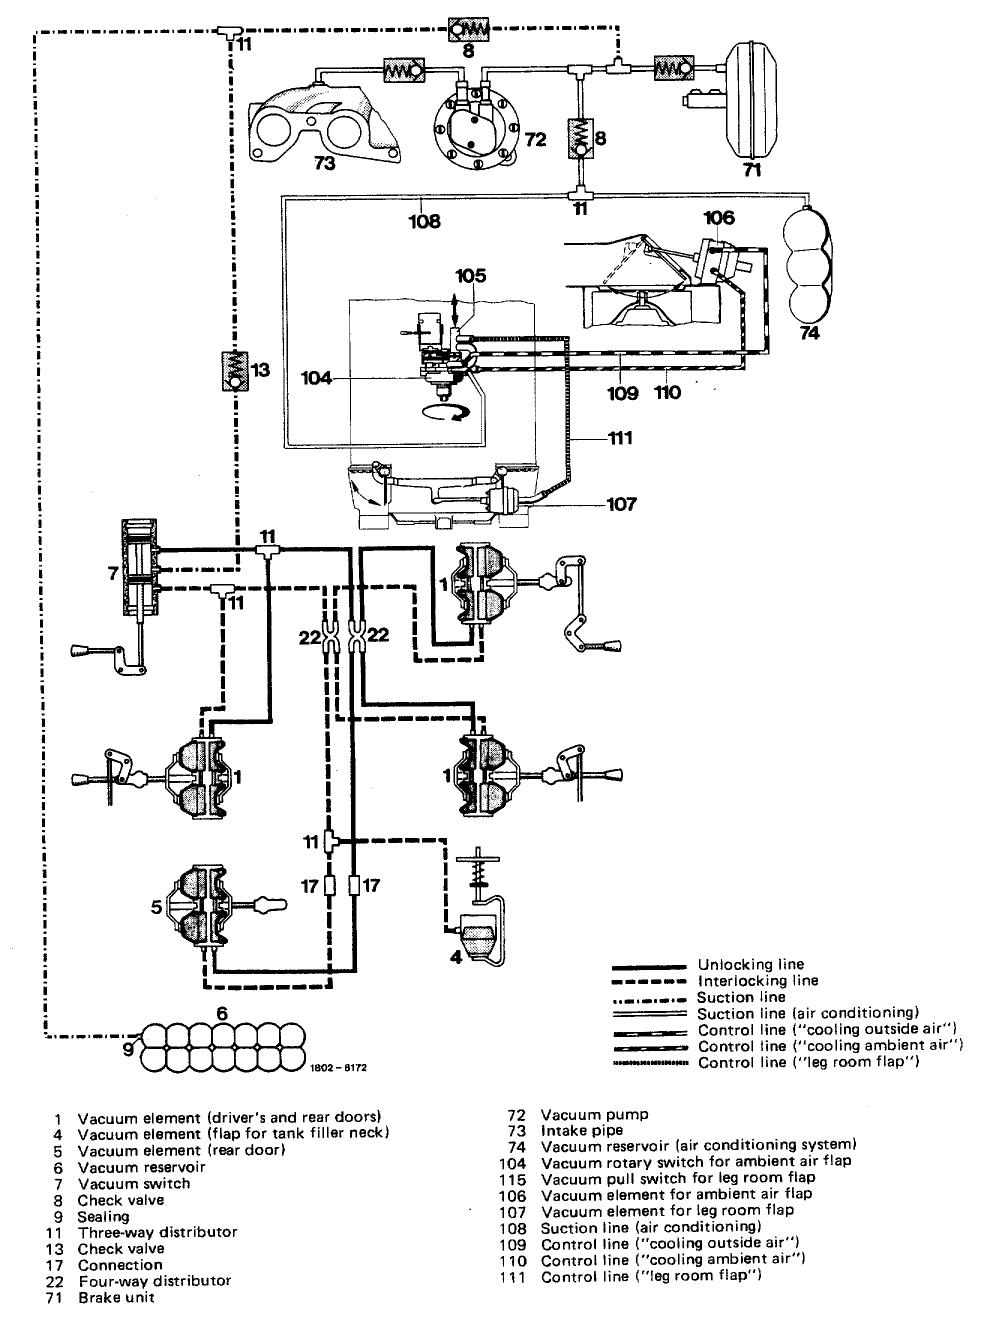 1979 Mercedes 450sl Fuse Box Trusted Wiring Diagram Window Switch Wiring  Diagram 1977 Mb 450sl